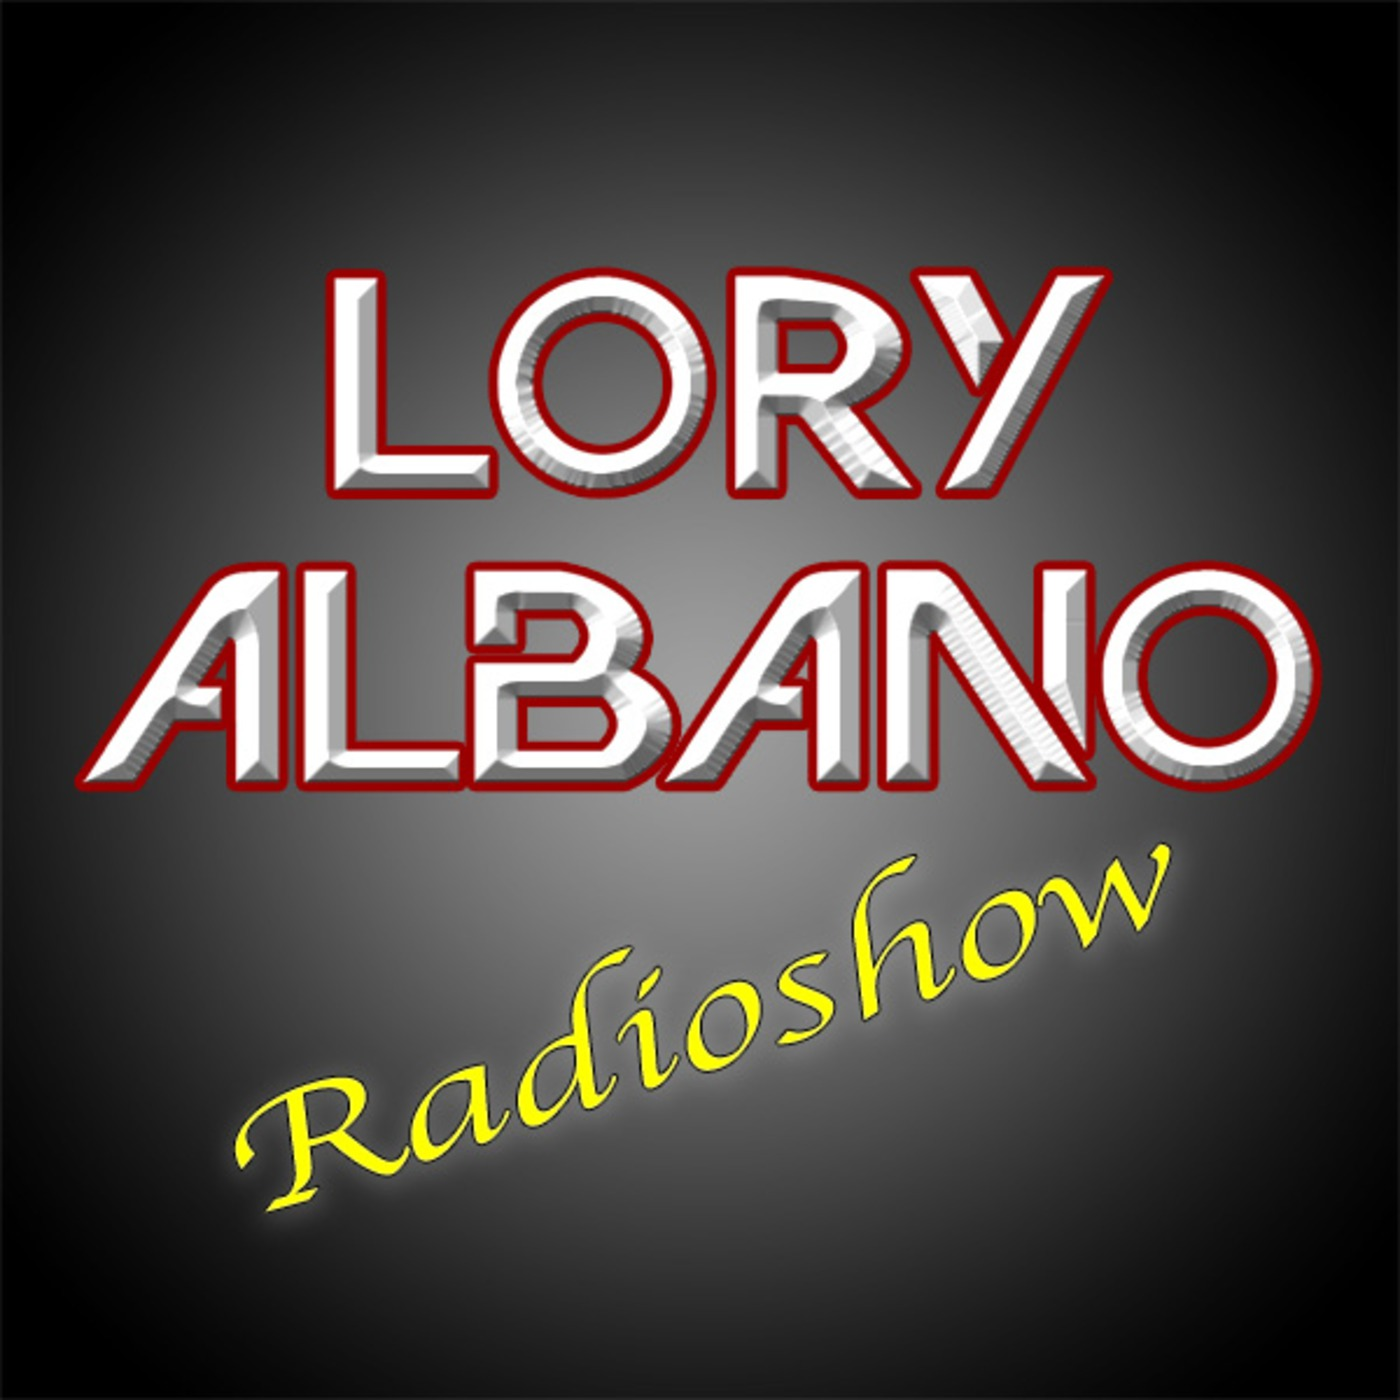 LORY ALBANO Radioshow